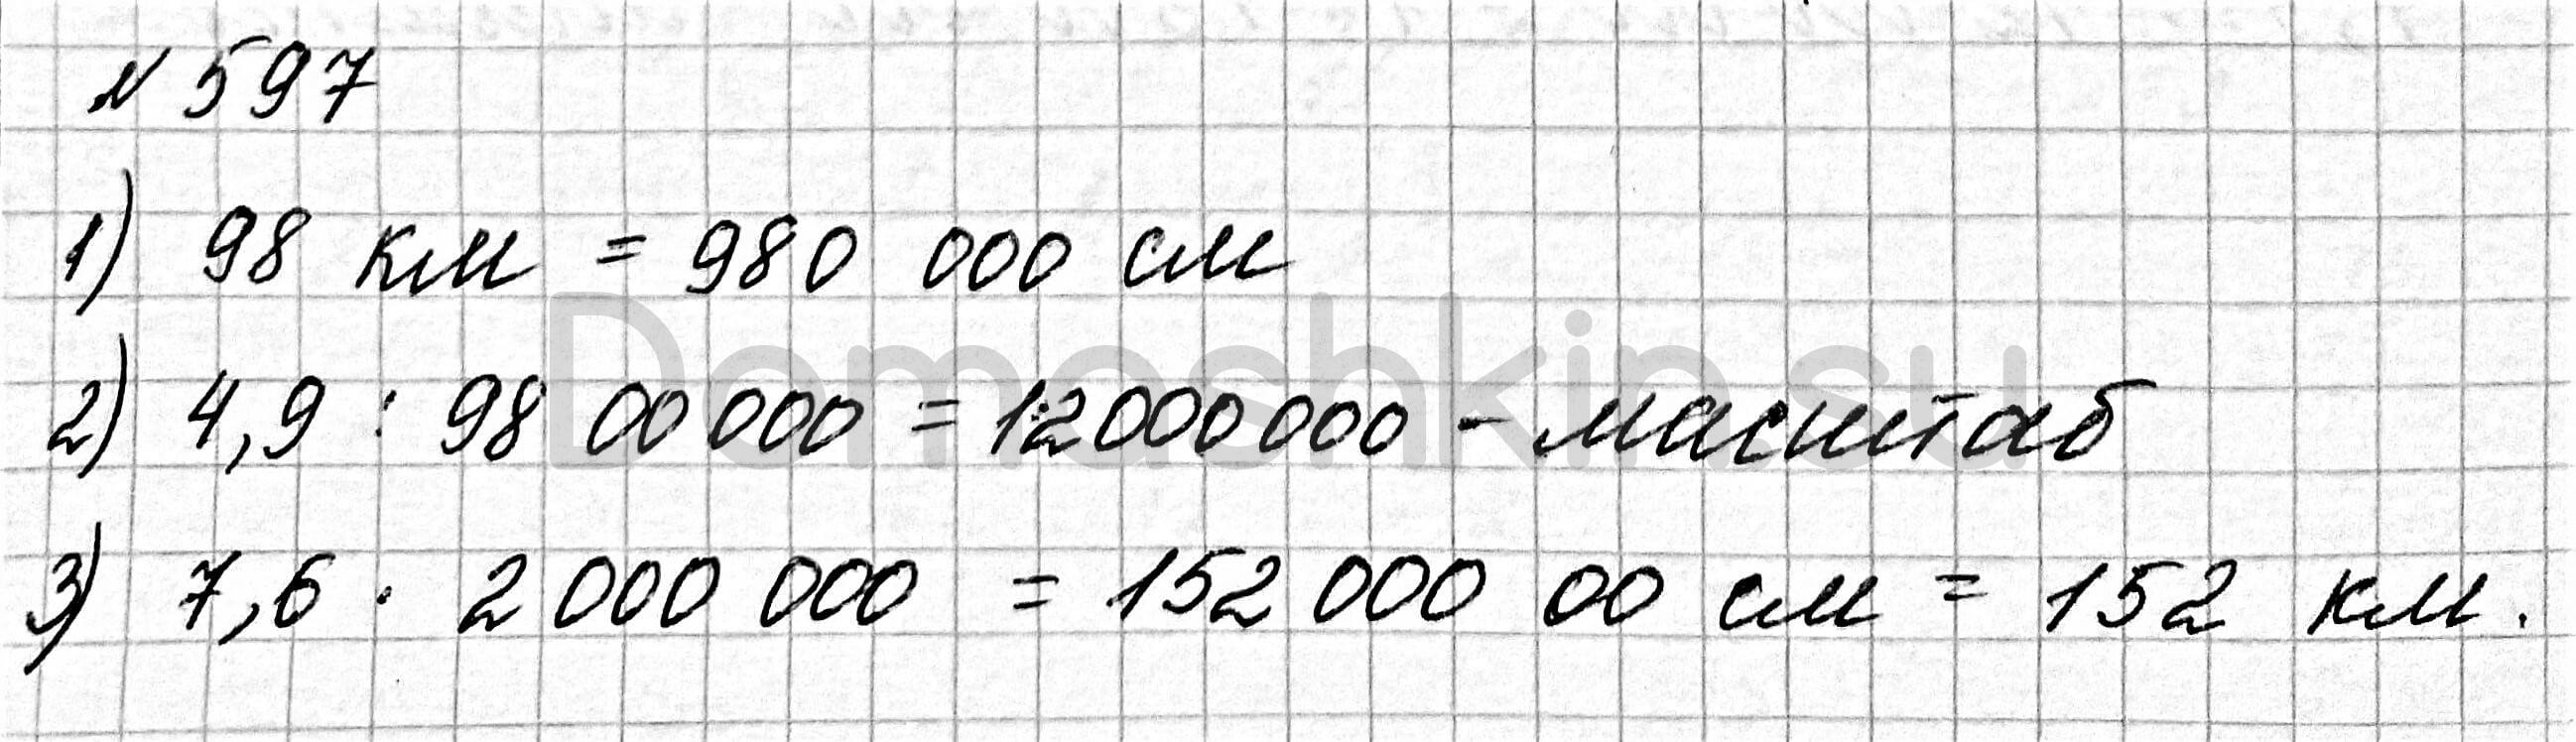 Математика 6 класс учебник Мерзляк номер 597 решение